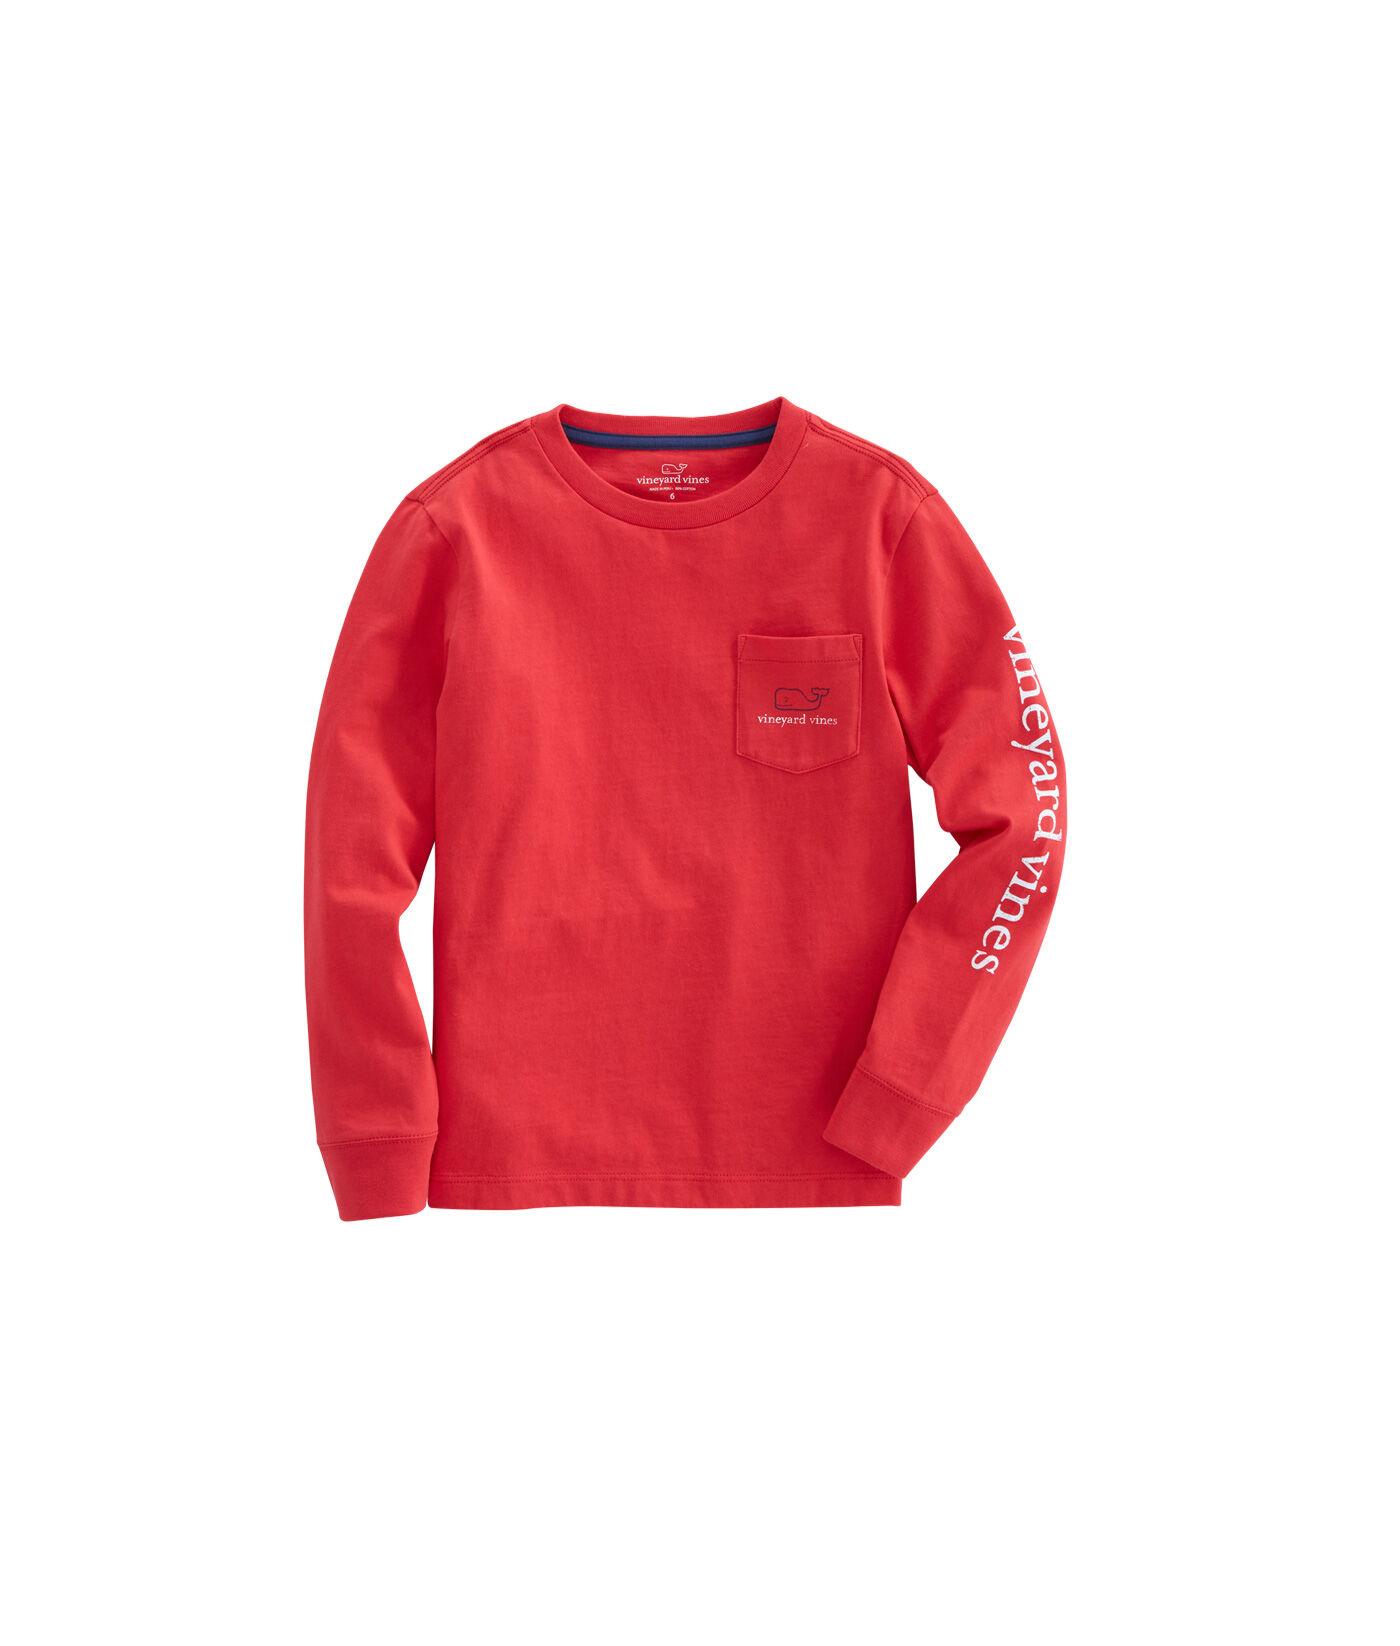 Vineyard Vines Boys Gray Heather Glow Vintage Whale Long Sleeve Pocket T-Shirt